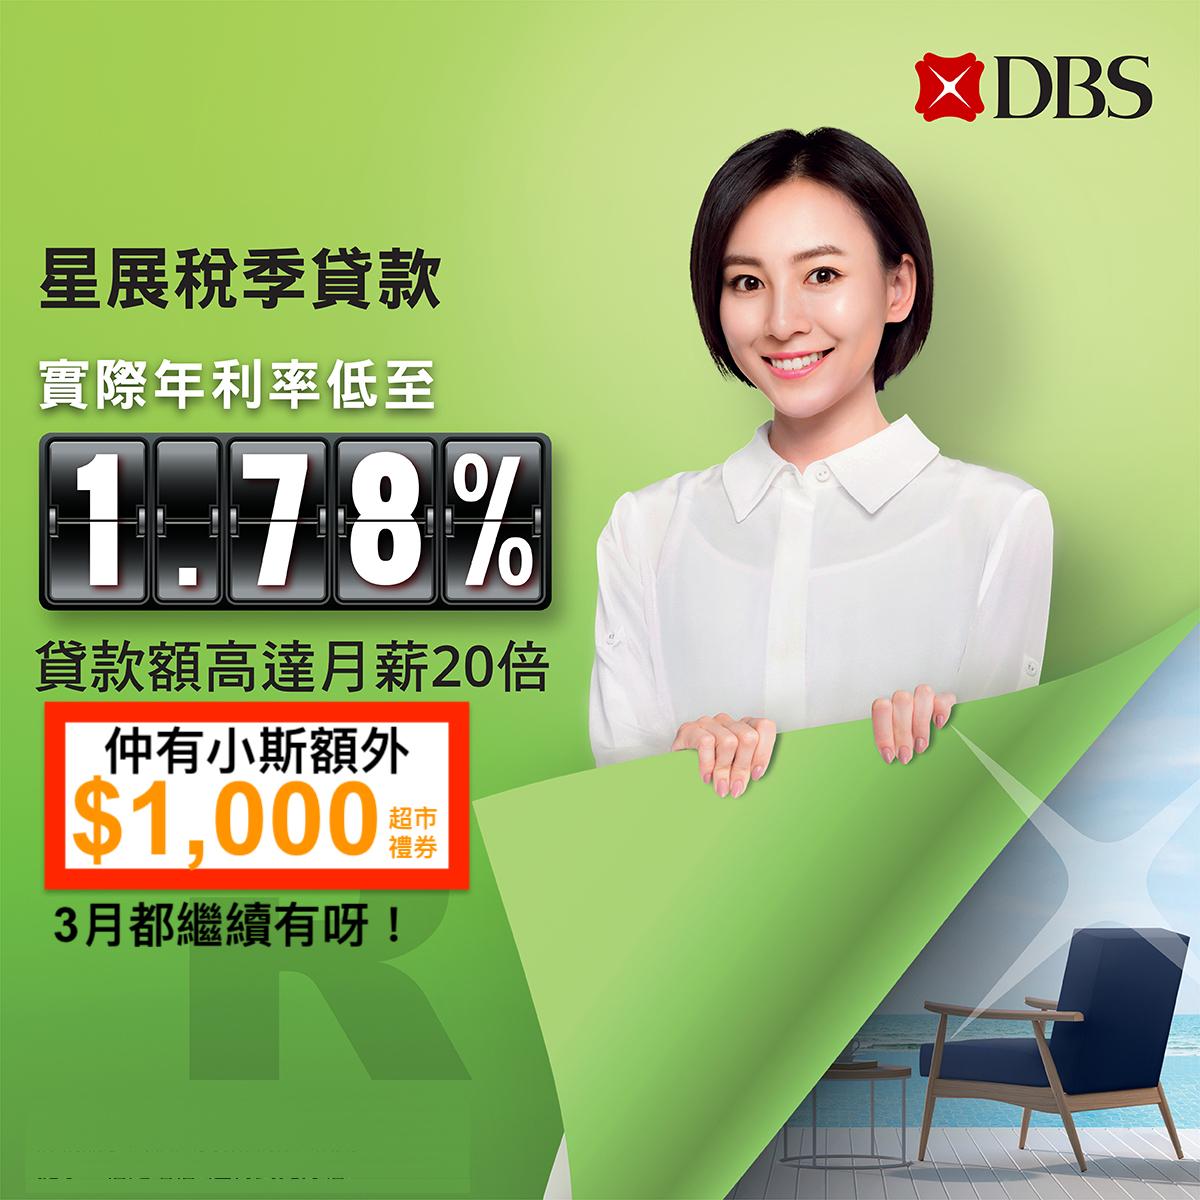 dbs限定稅季貸款優惠